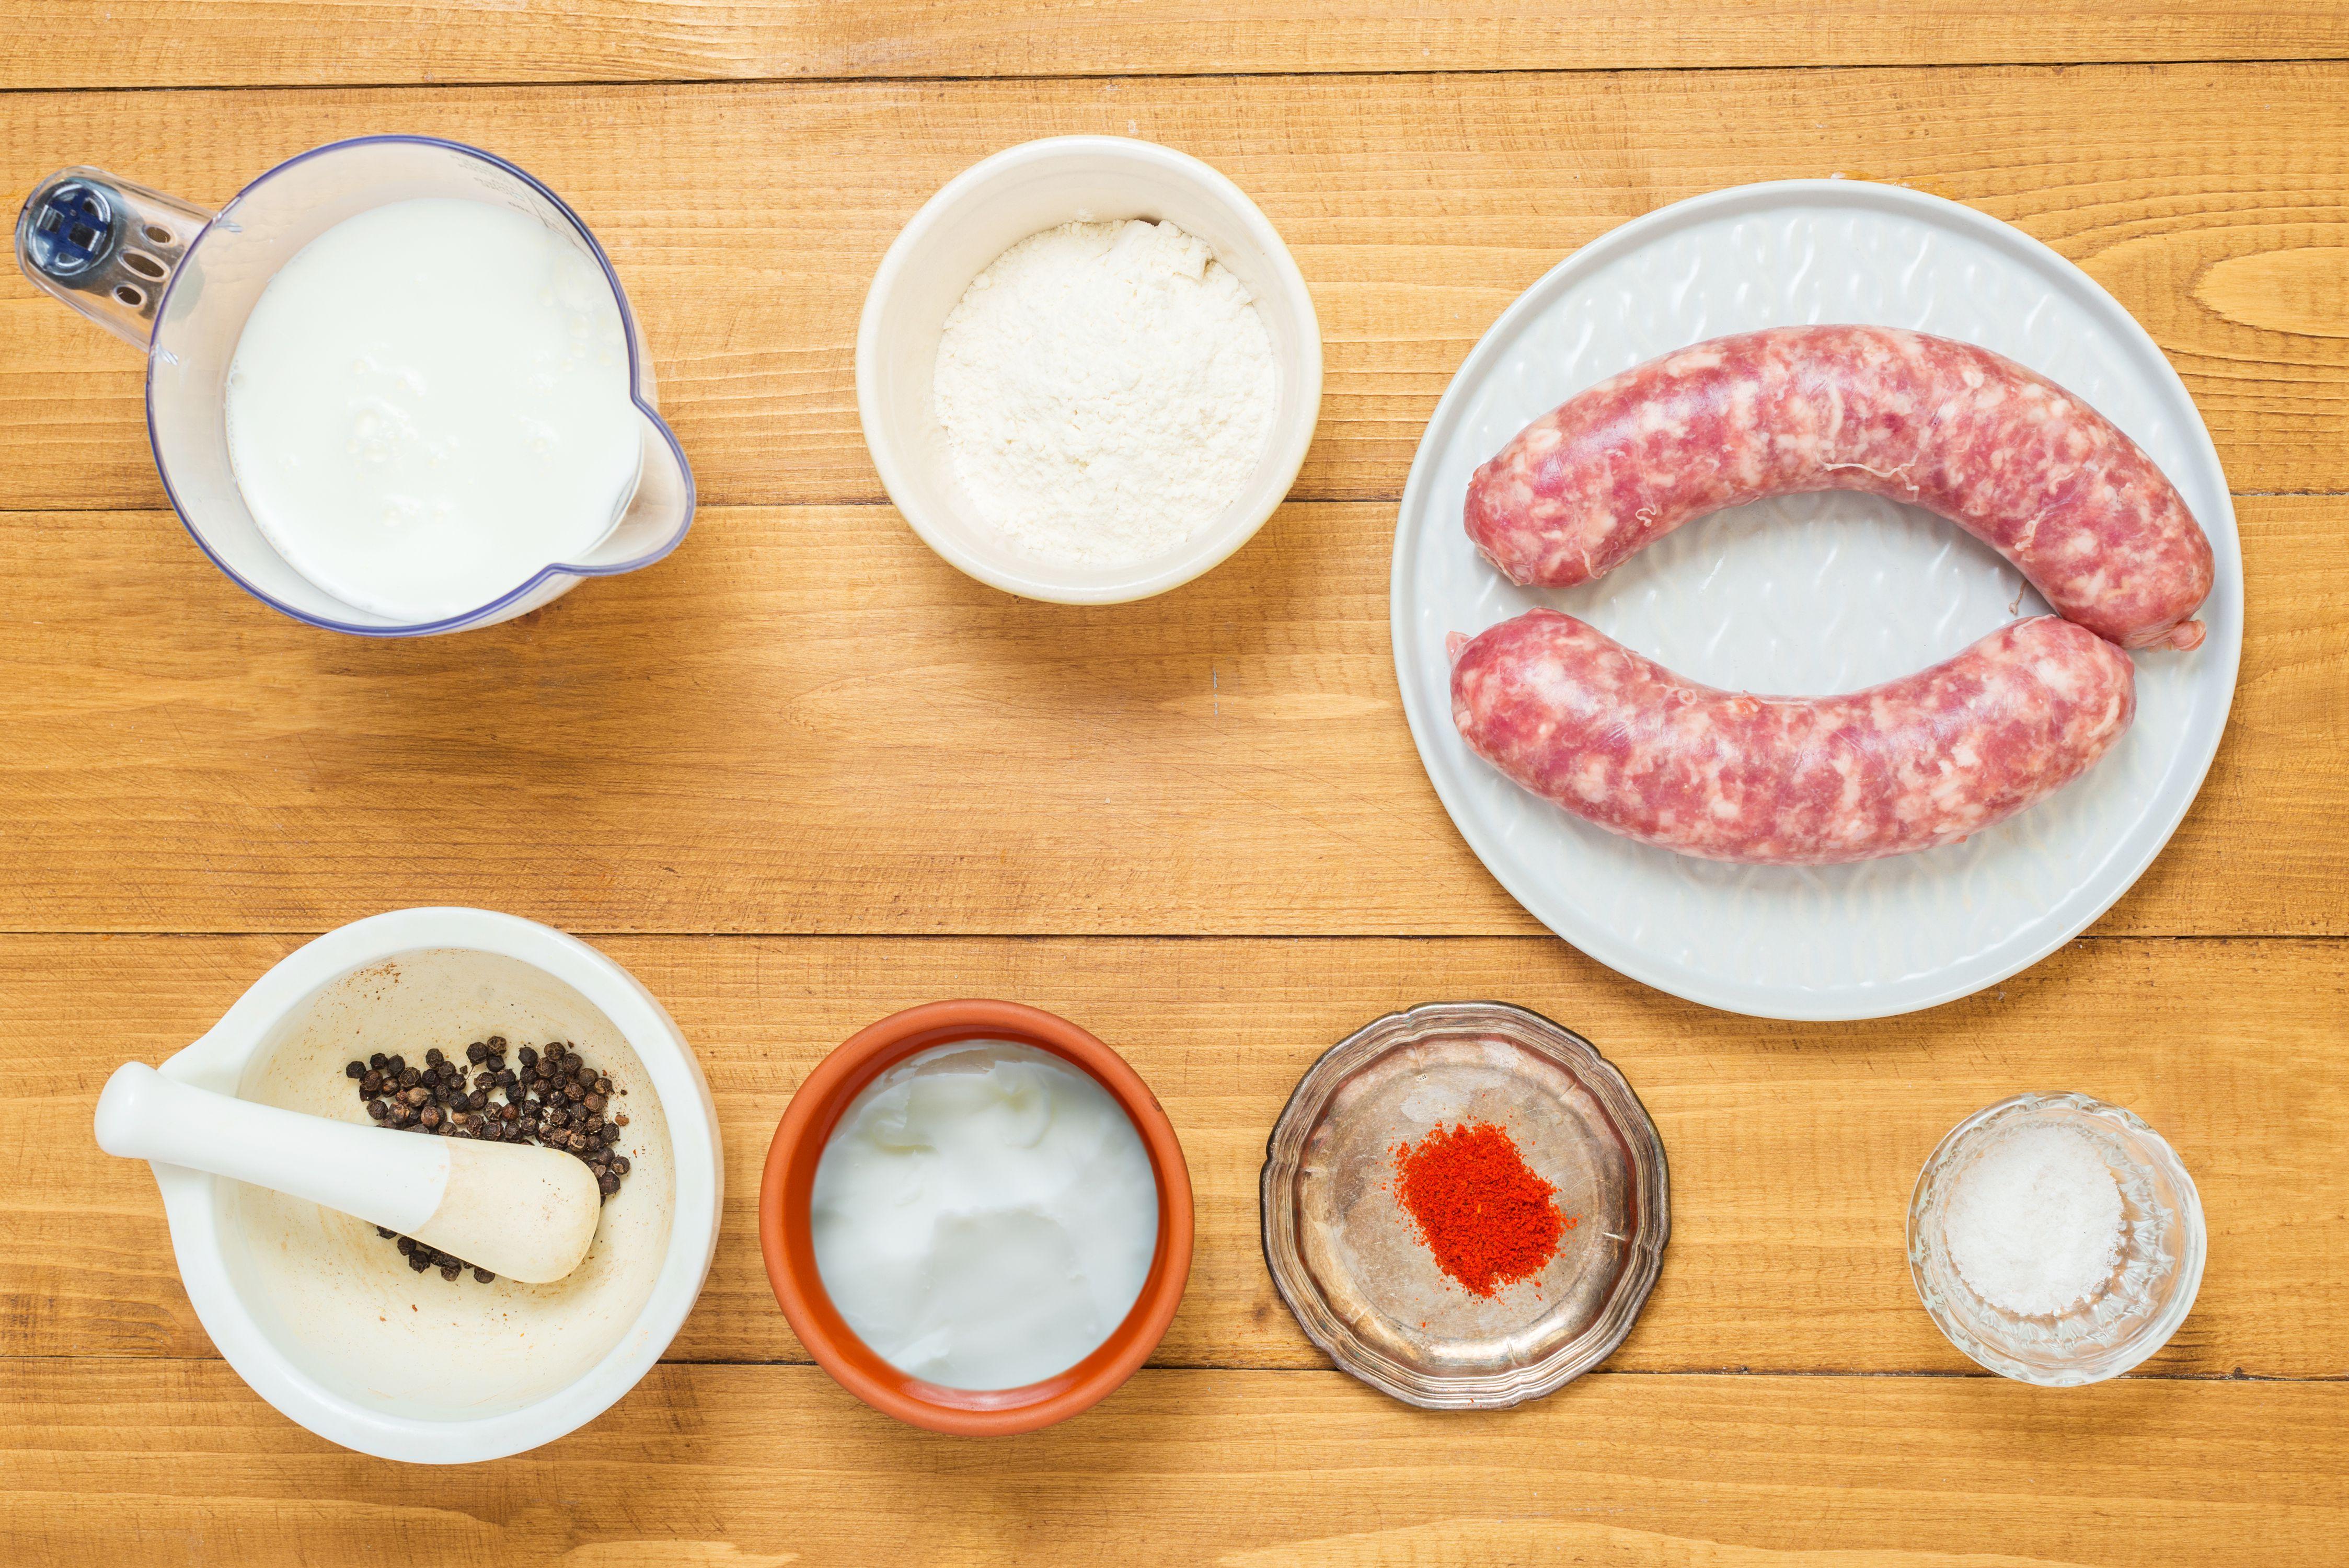 Homemade southern sausage gravy ingredients.